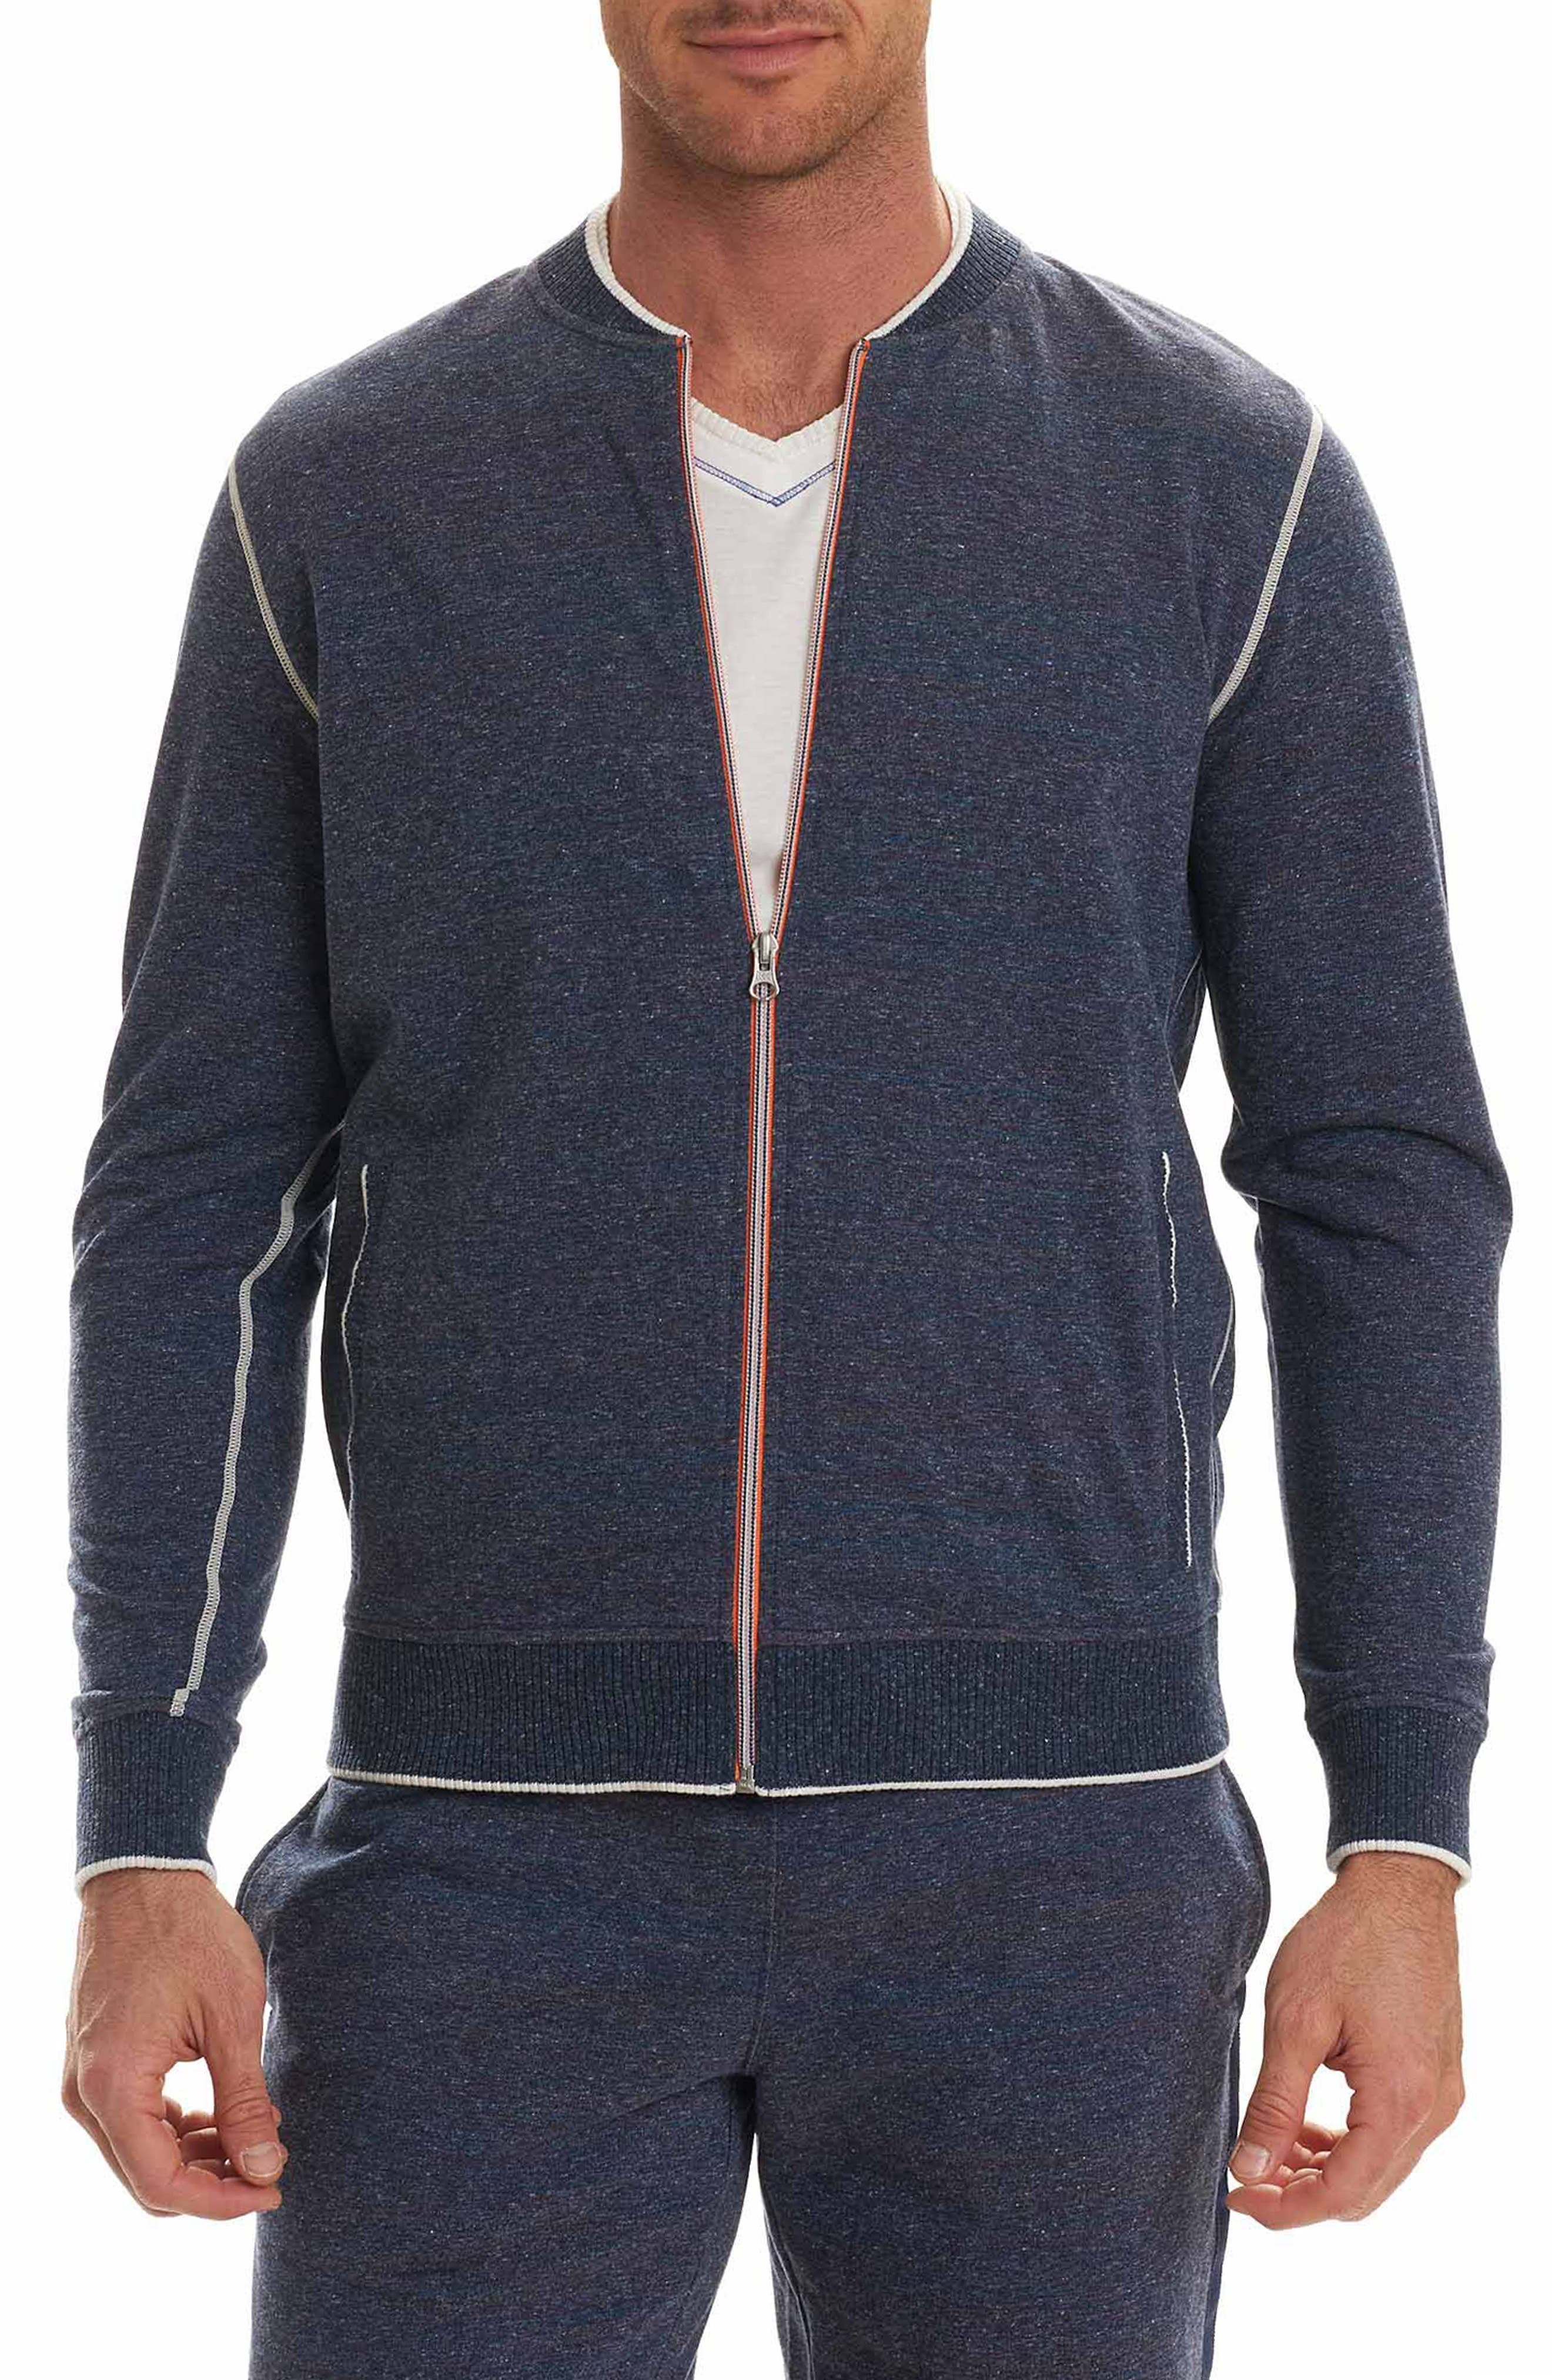 Vagabond Full Zip Fleece Bomber Jacket,                         Main,                         color, 411